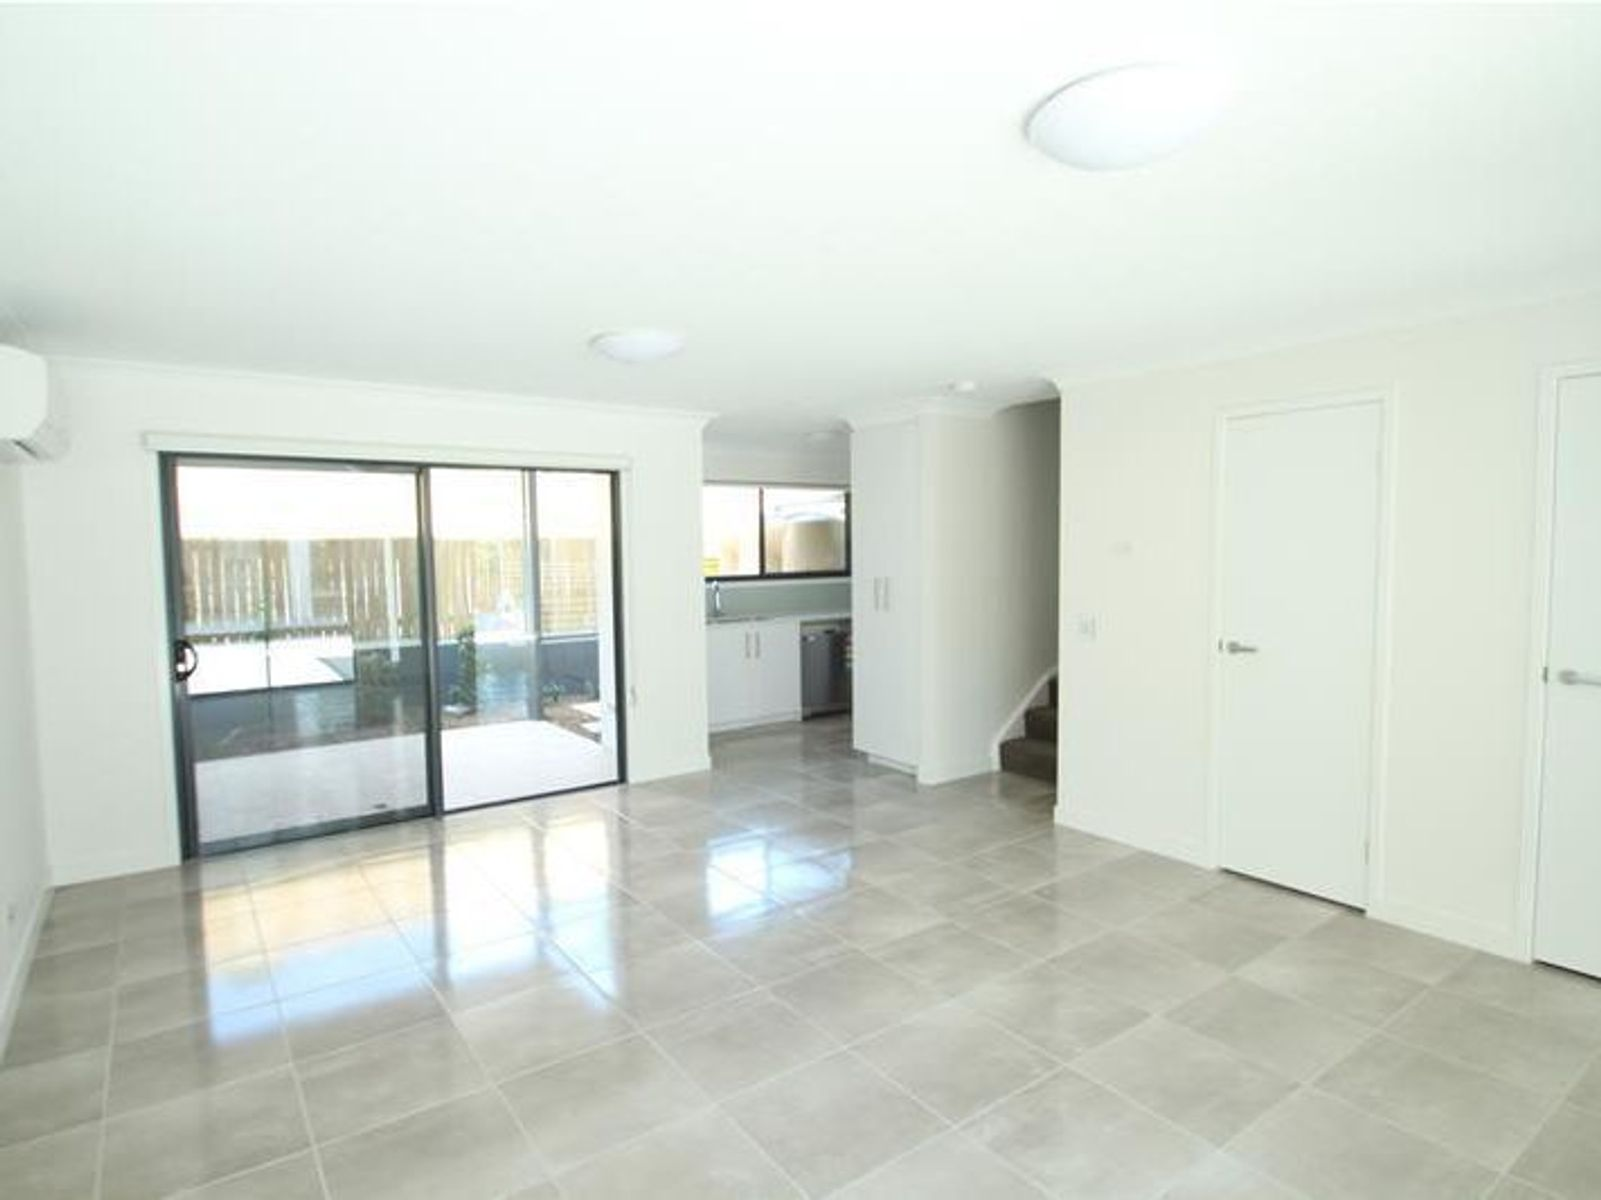 10/22 Careel Close, Helensvale, QLD 4212